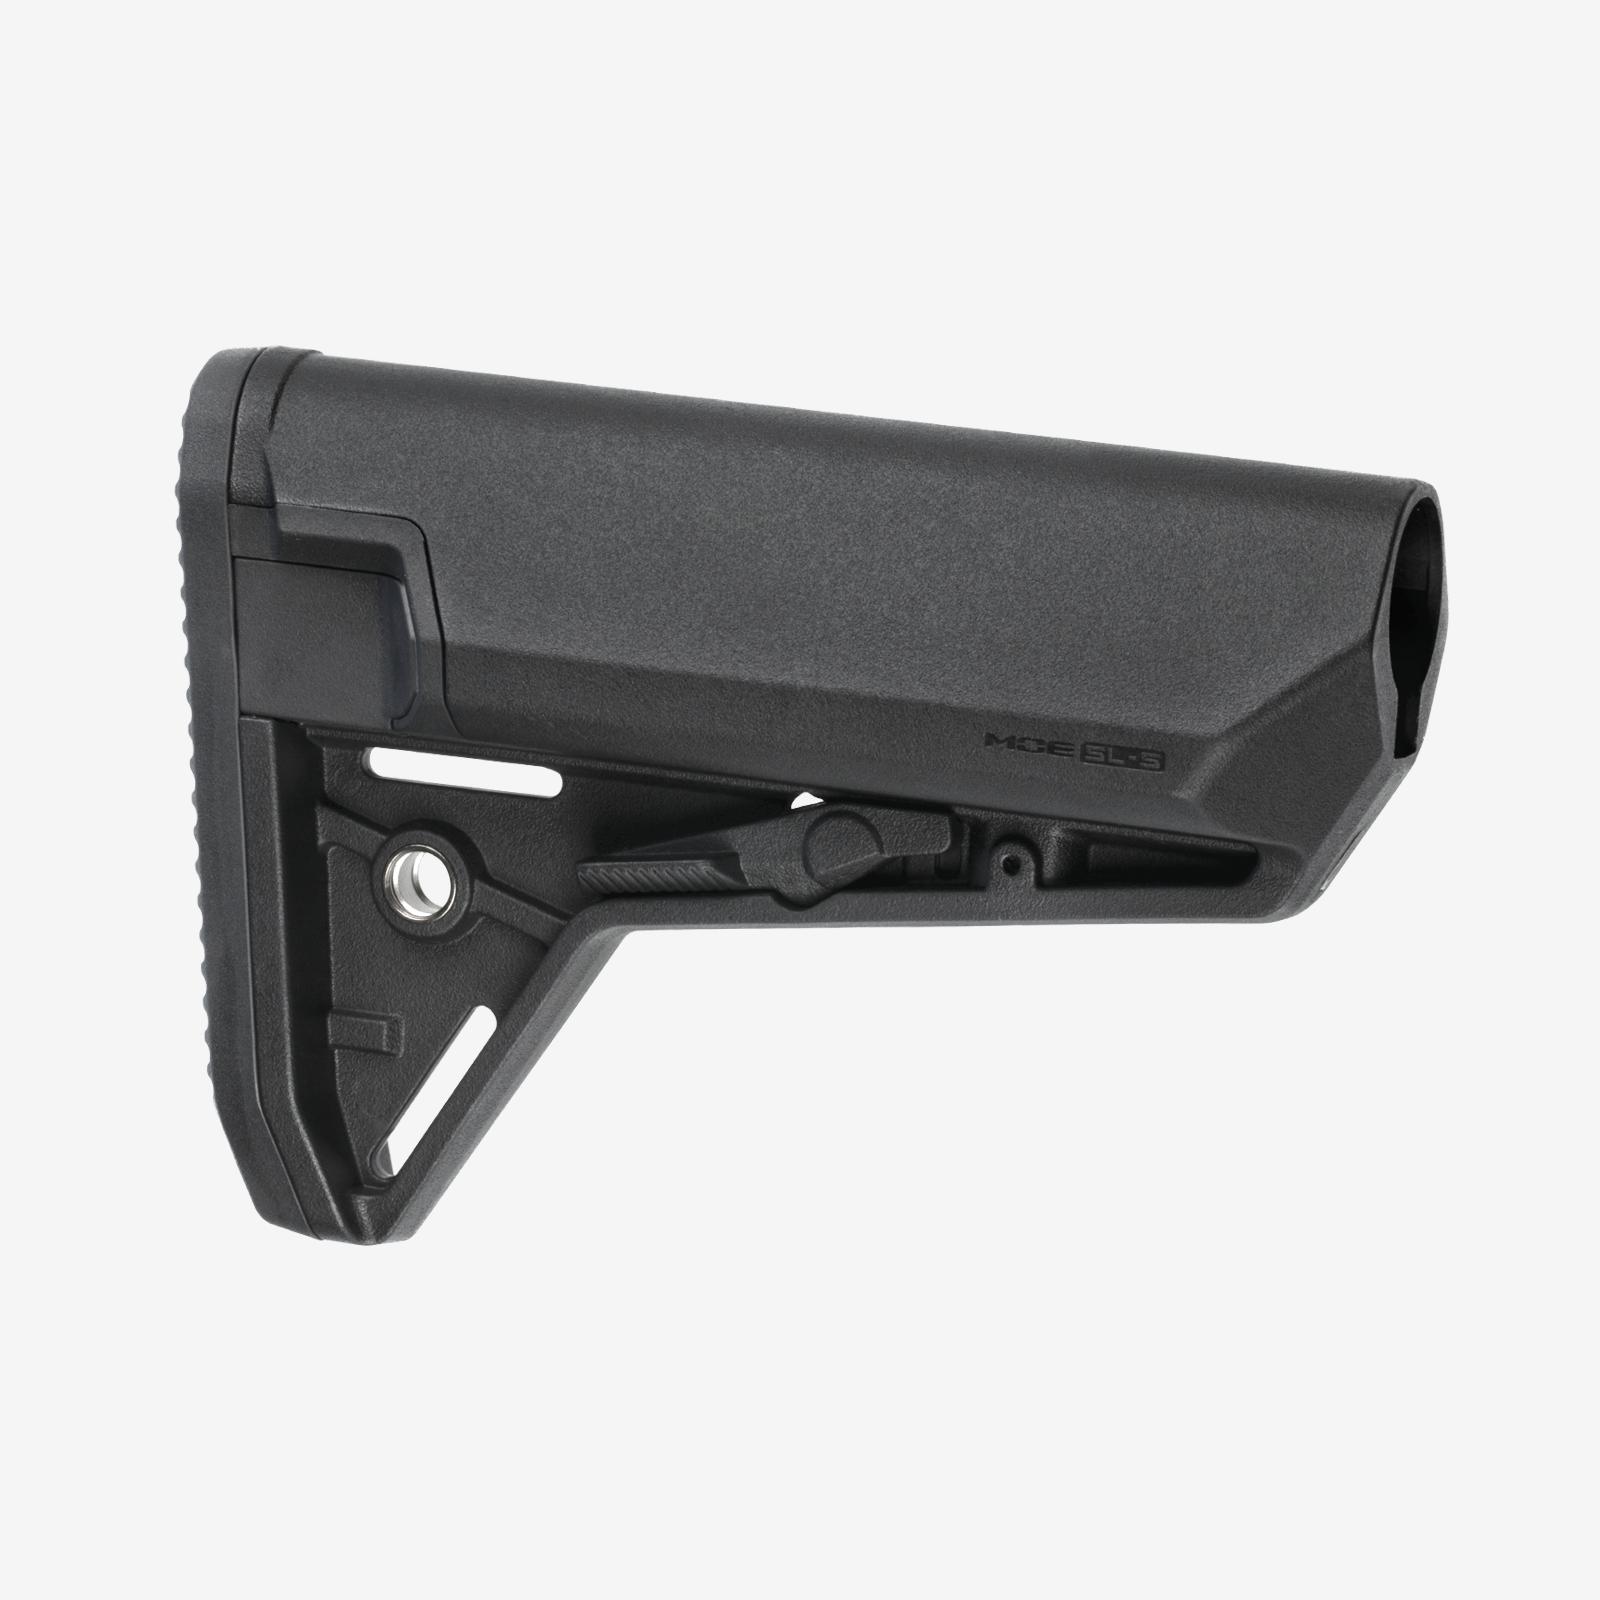 Magpul MOE SL-S Carbine Stock Mil-Spec